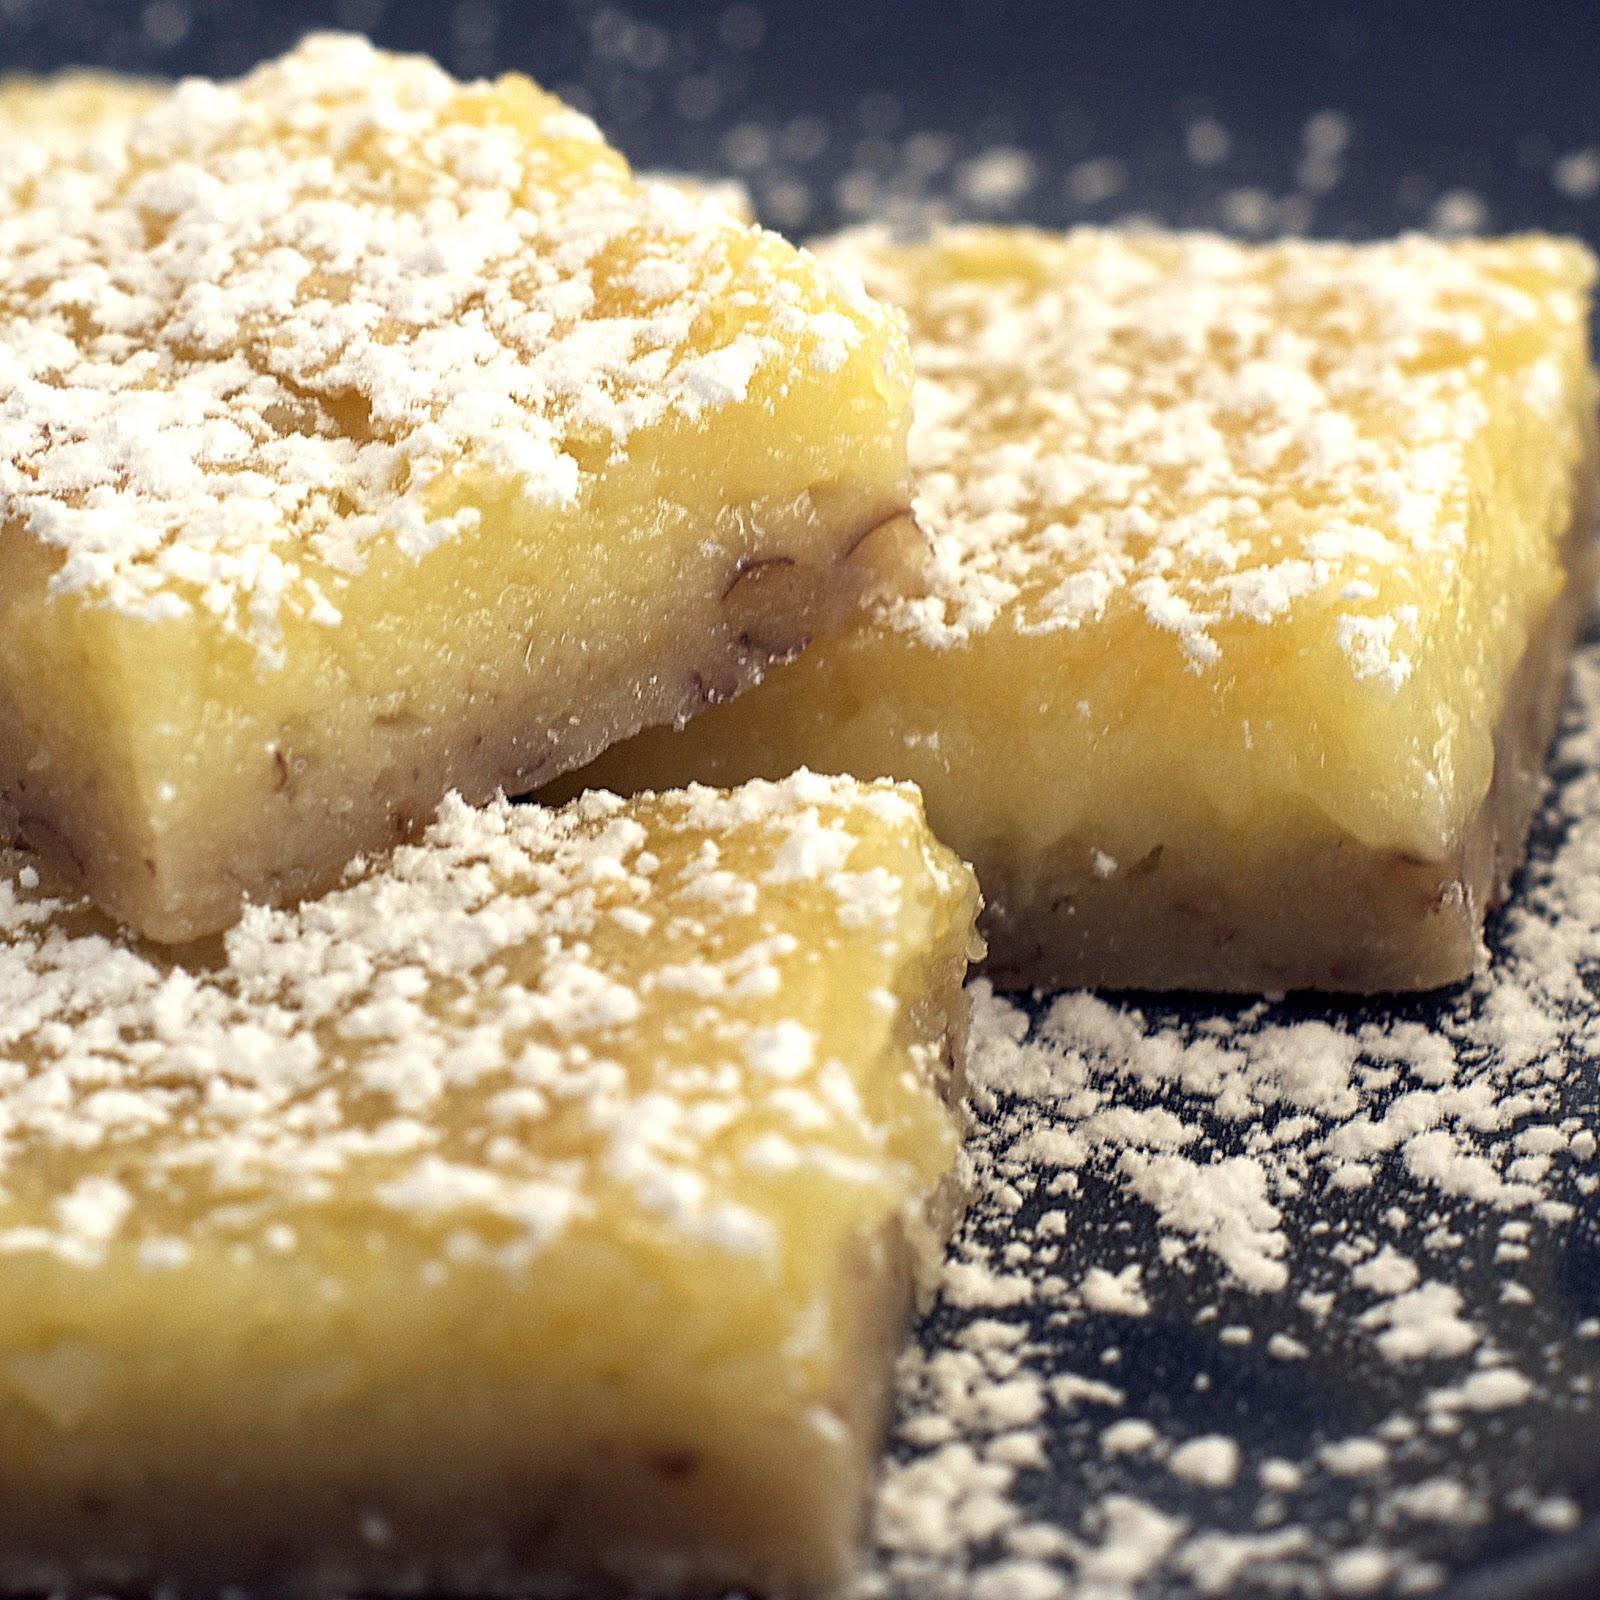 Creamy Lemon Nut Bars